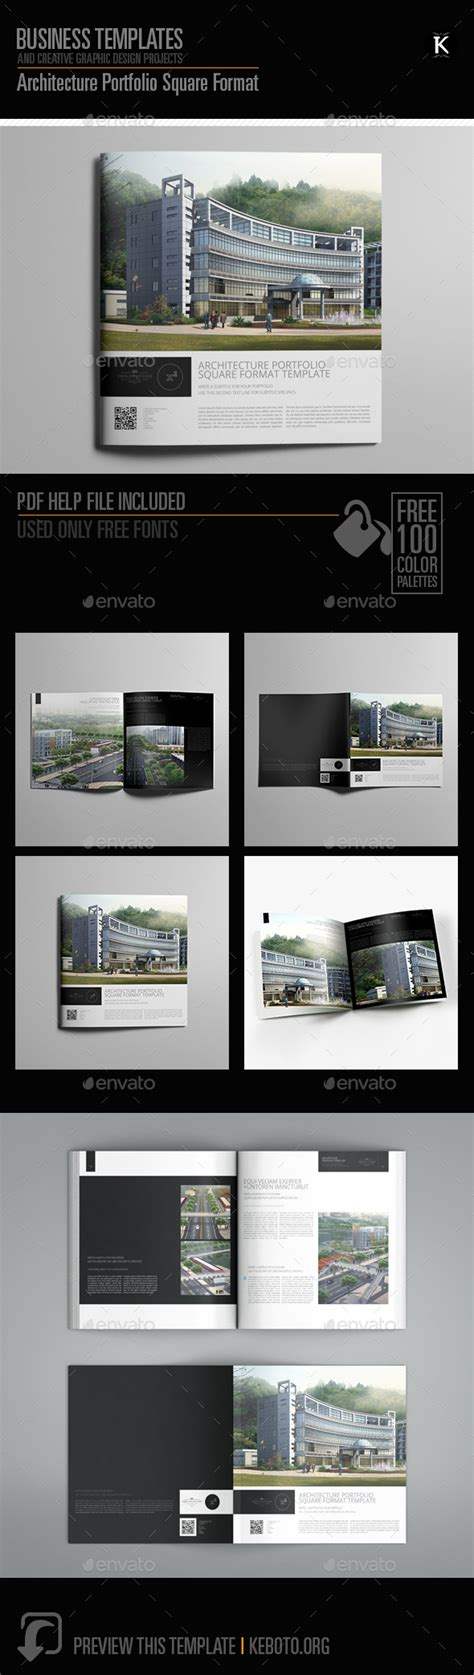 14827 architecture portfolio template architecture portfolio design templates www pixshark